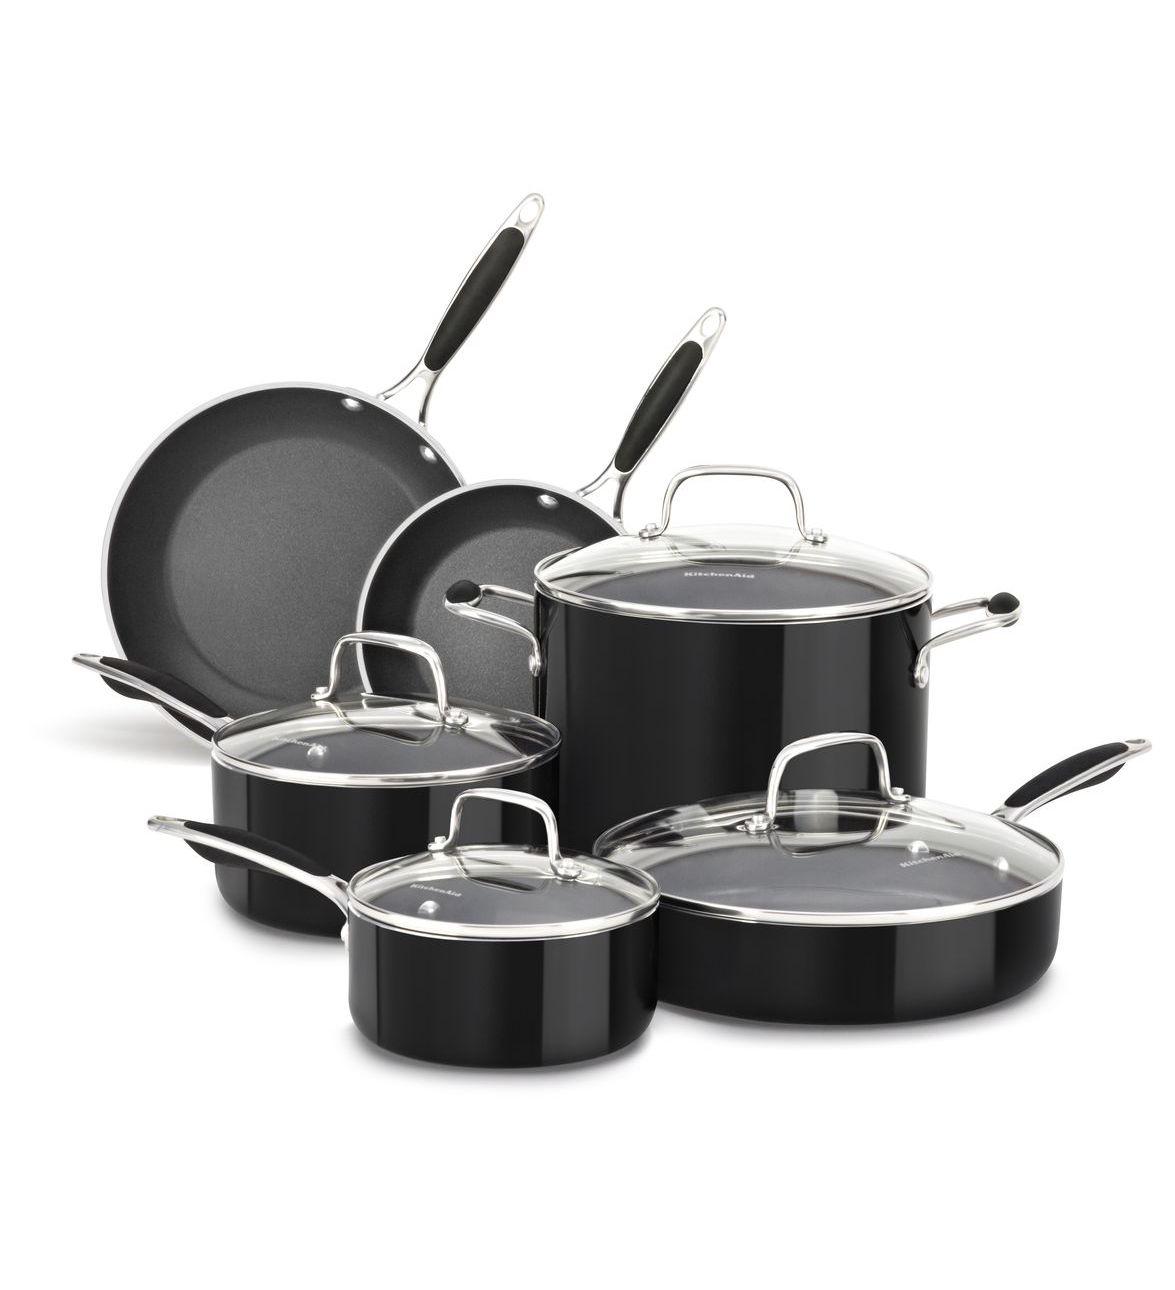 Kitchen aid pots and pans photo - 1